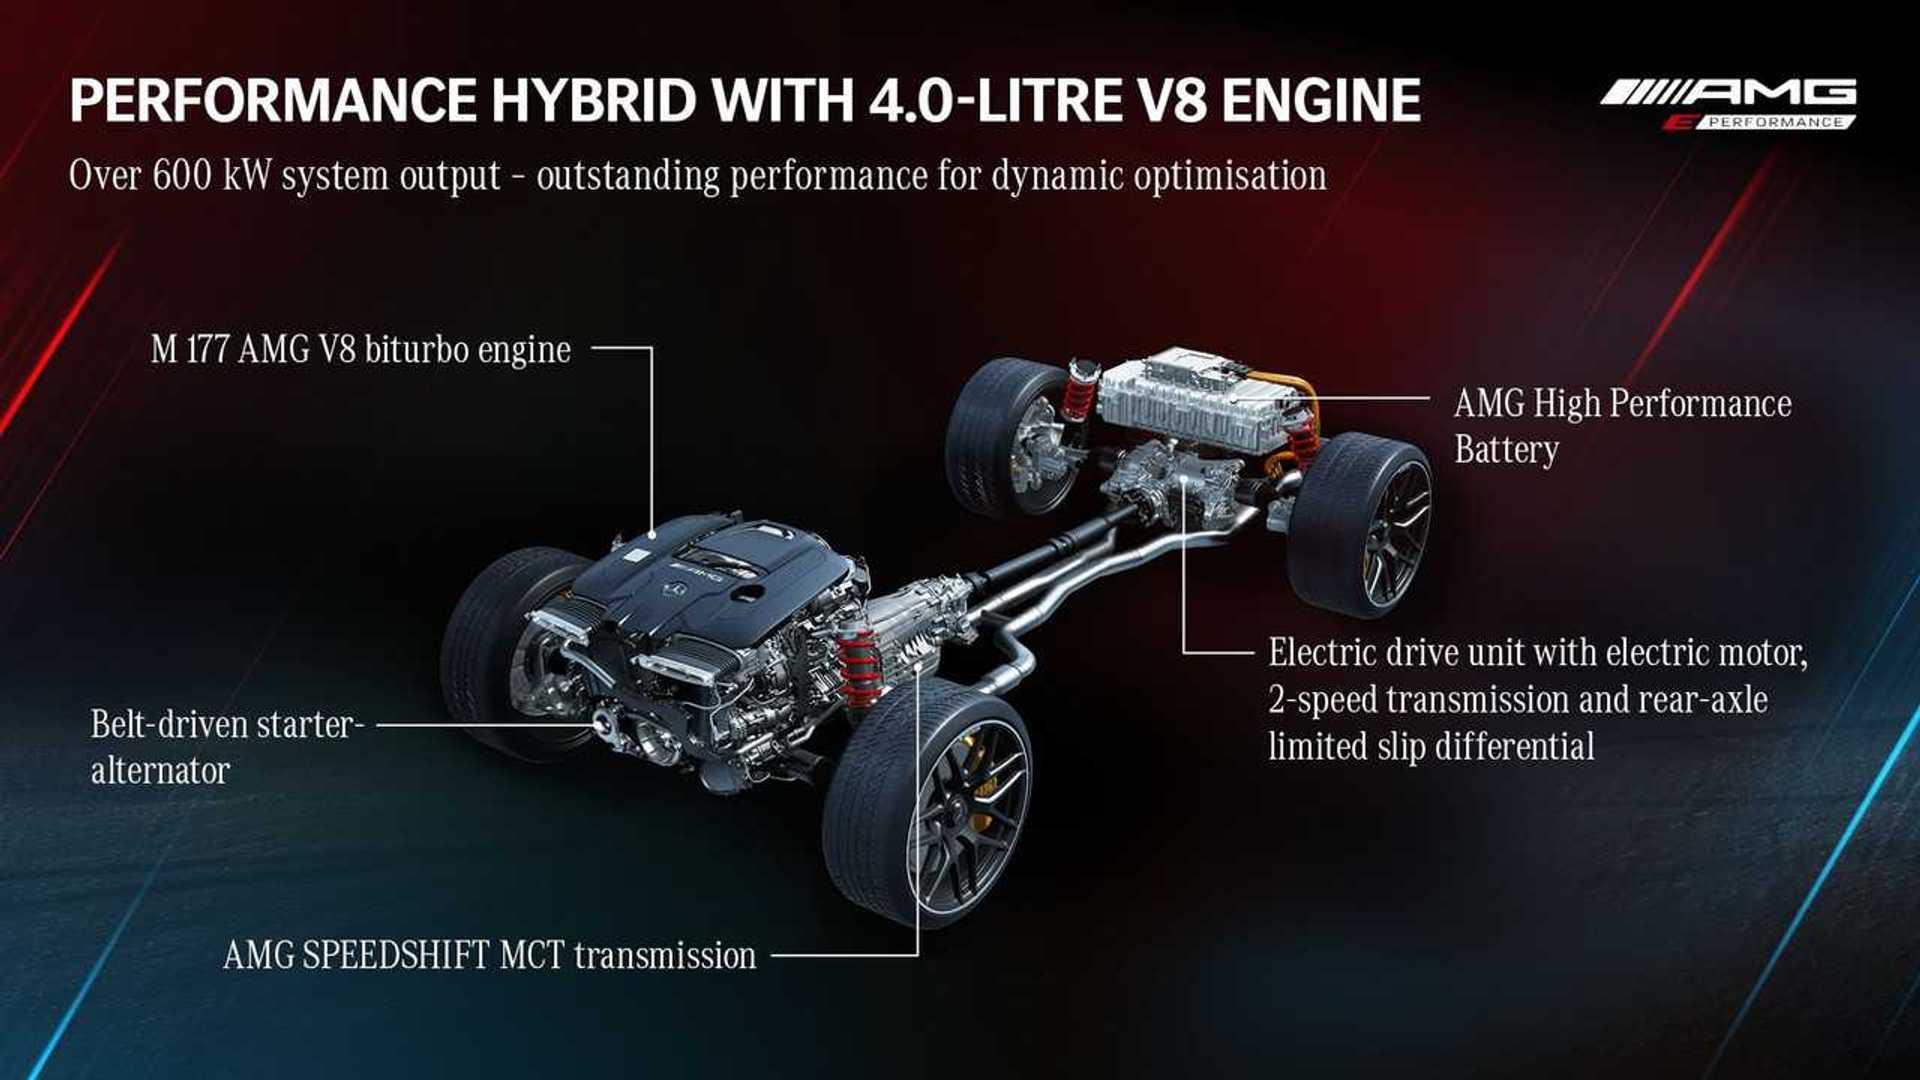 2021-mercedes-amg-e-performance.jpg